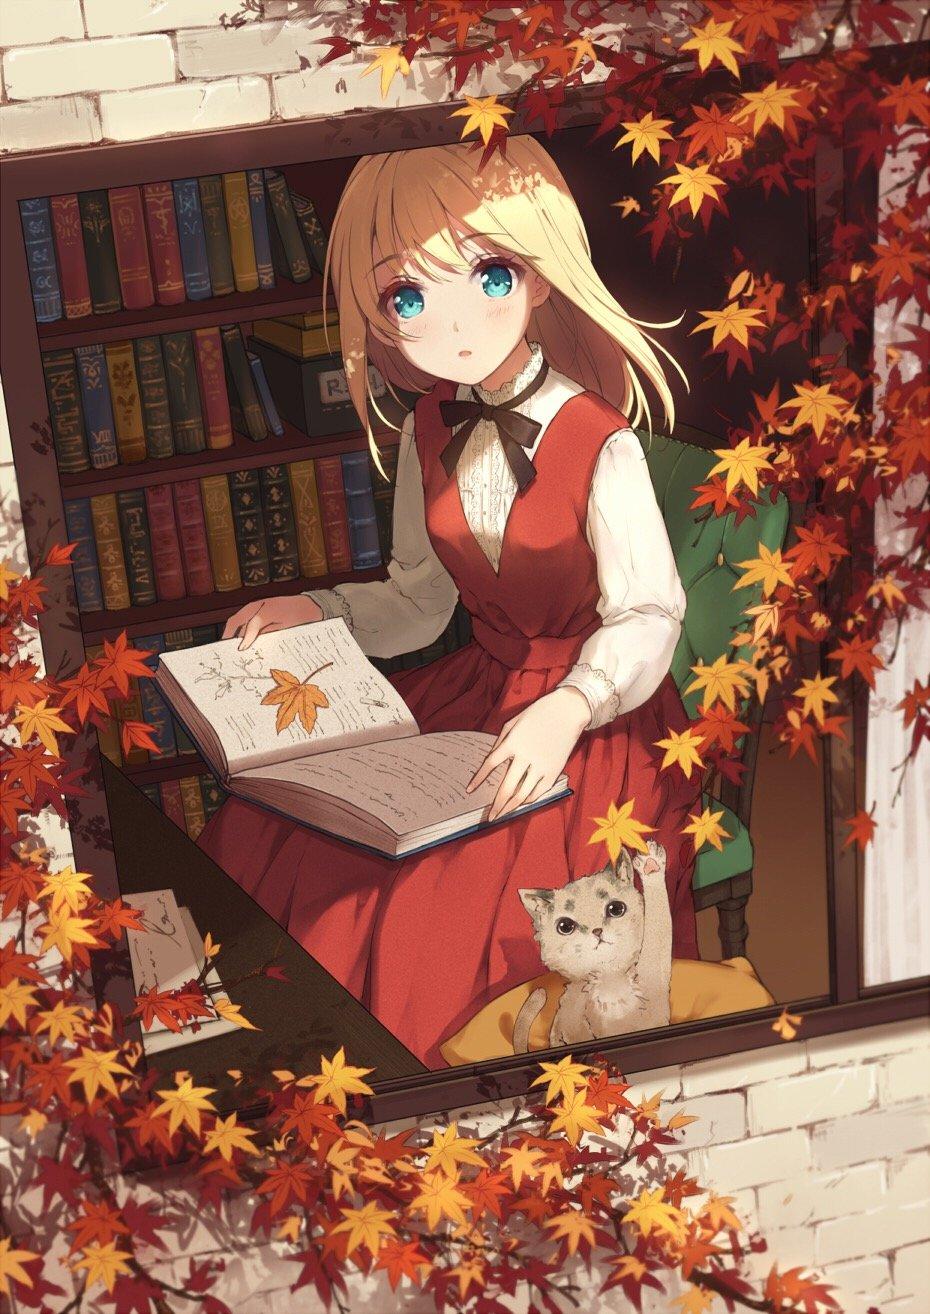 Аниме картинки осень девушка, книжки днем